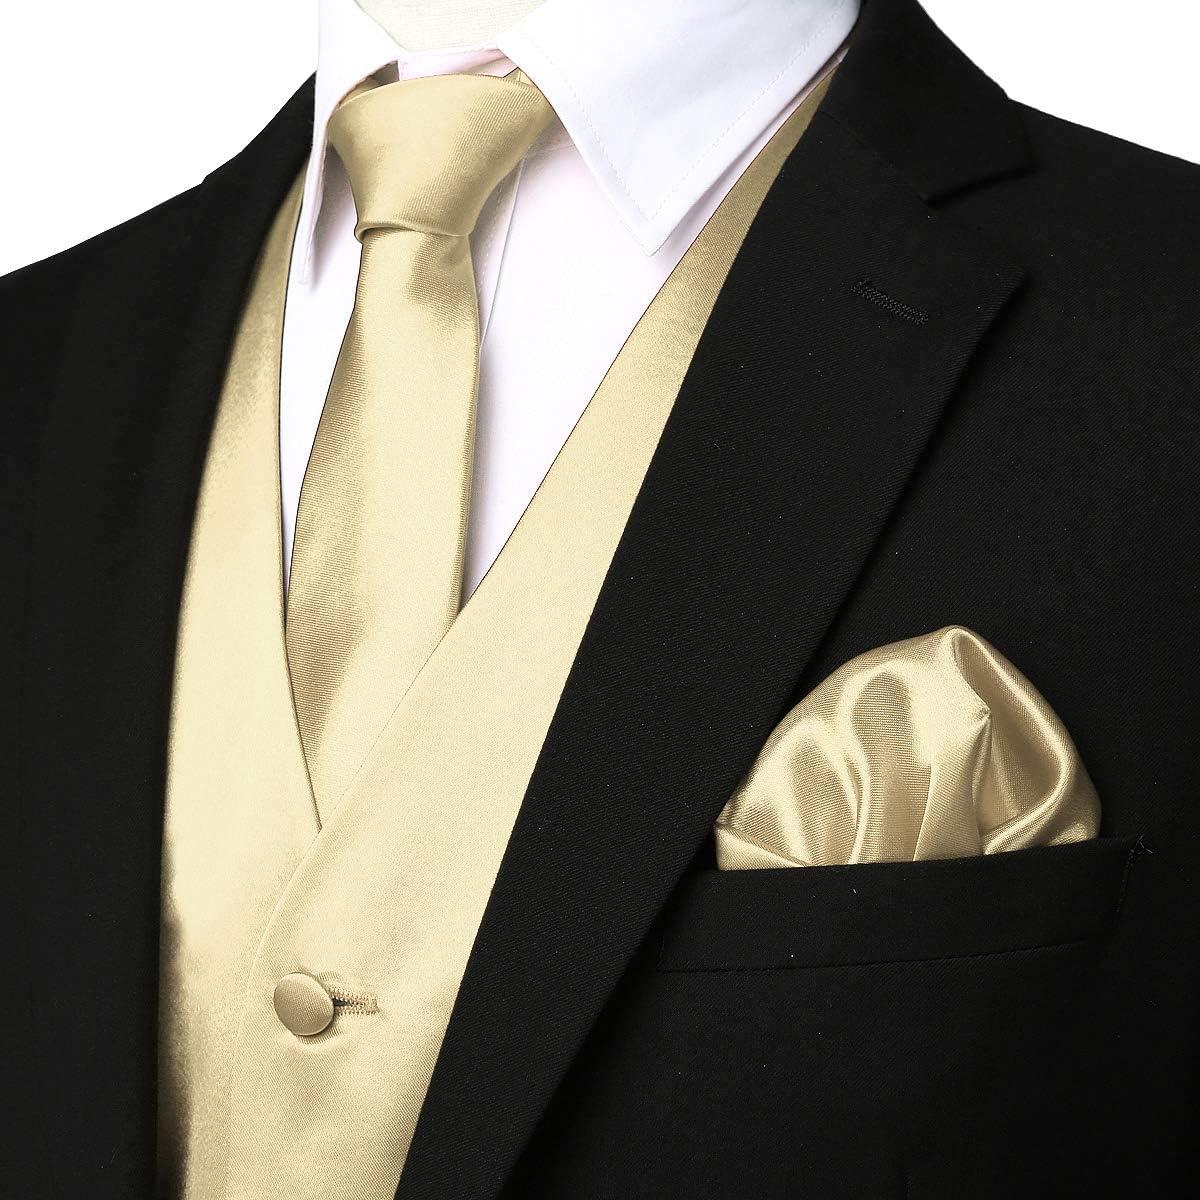 ZEROYAA OFFicial mail order Men's Solid Very popular 4pc Shiny Satin Pocket Vest Necktie Bowtie S